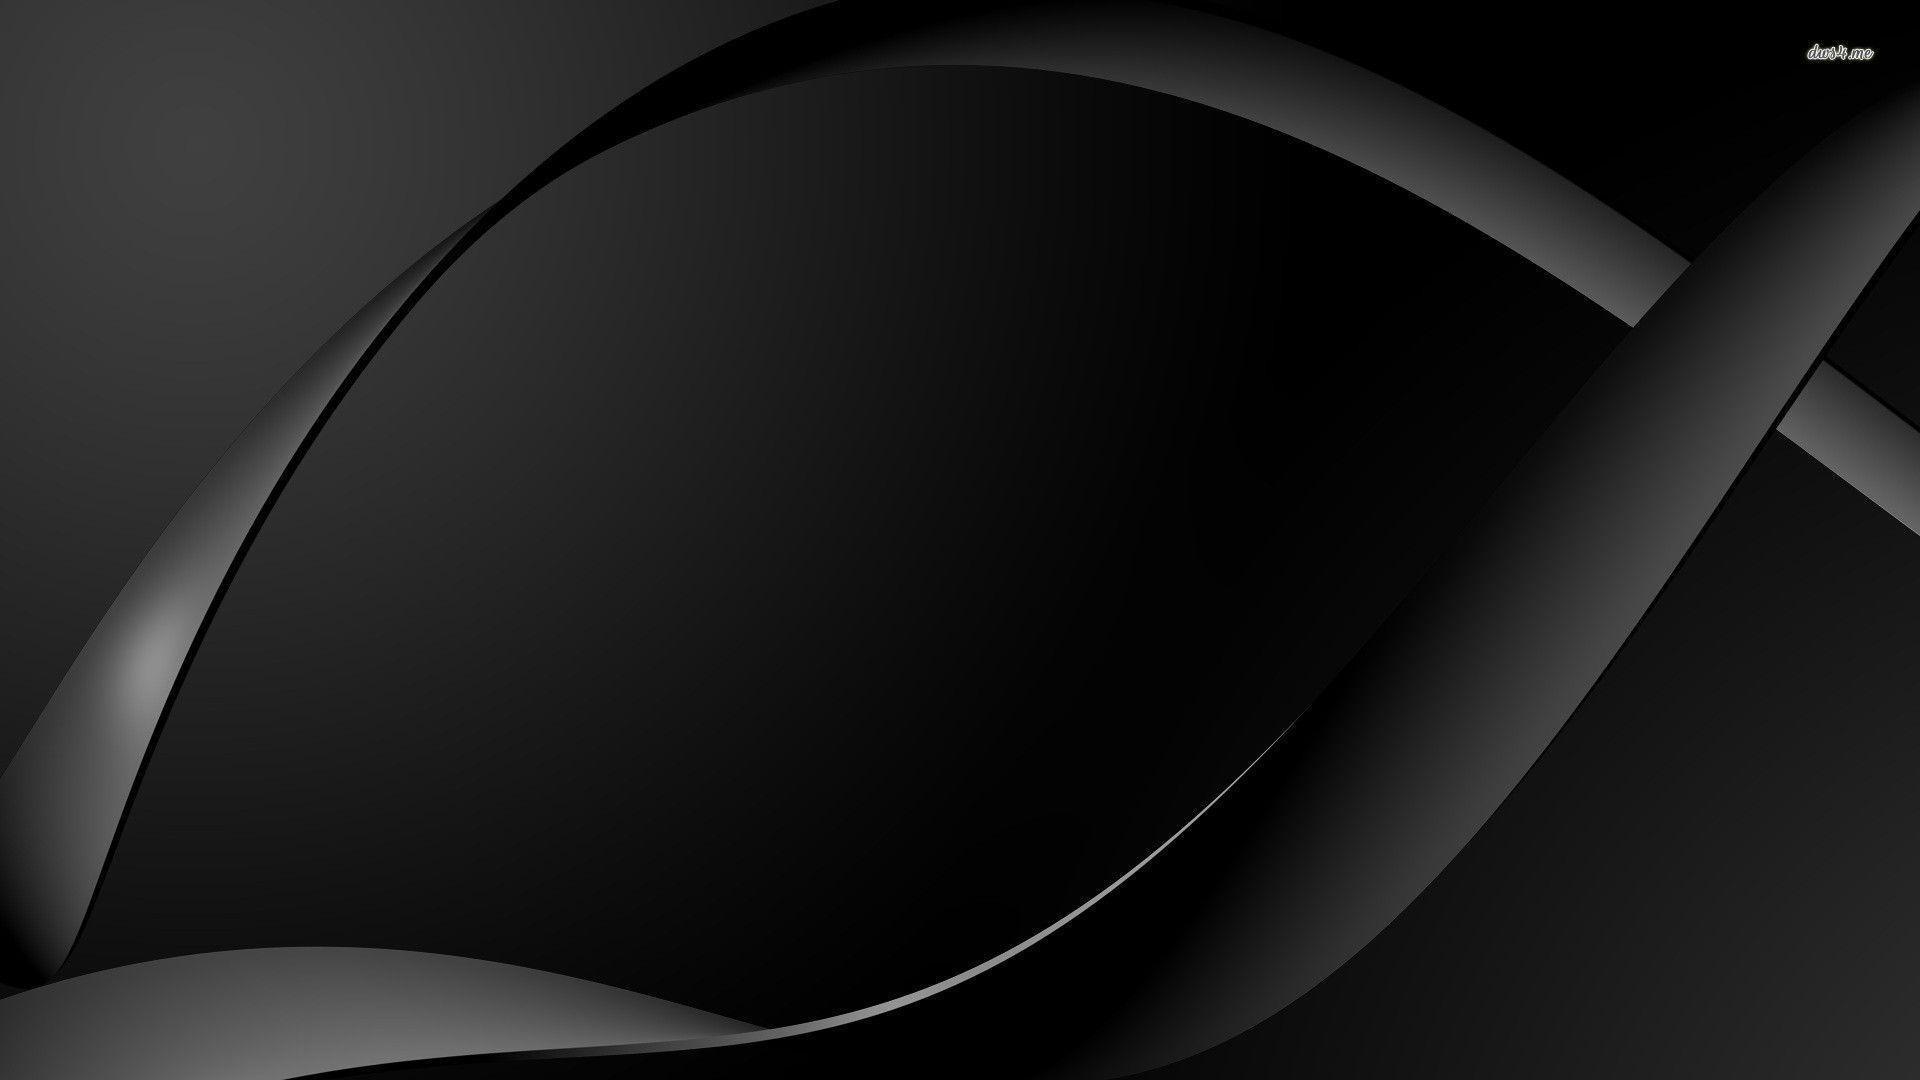 Black Abstract Wallpaper Hd Widescreen 10 HD Wallpapers   lzamgs.